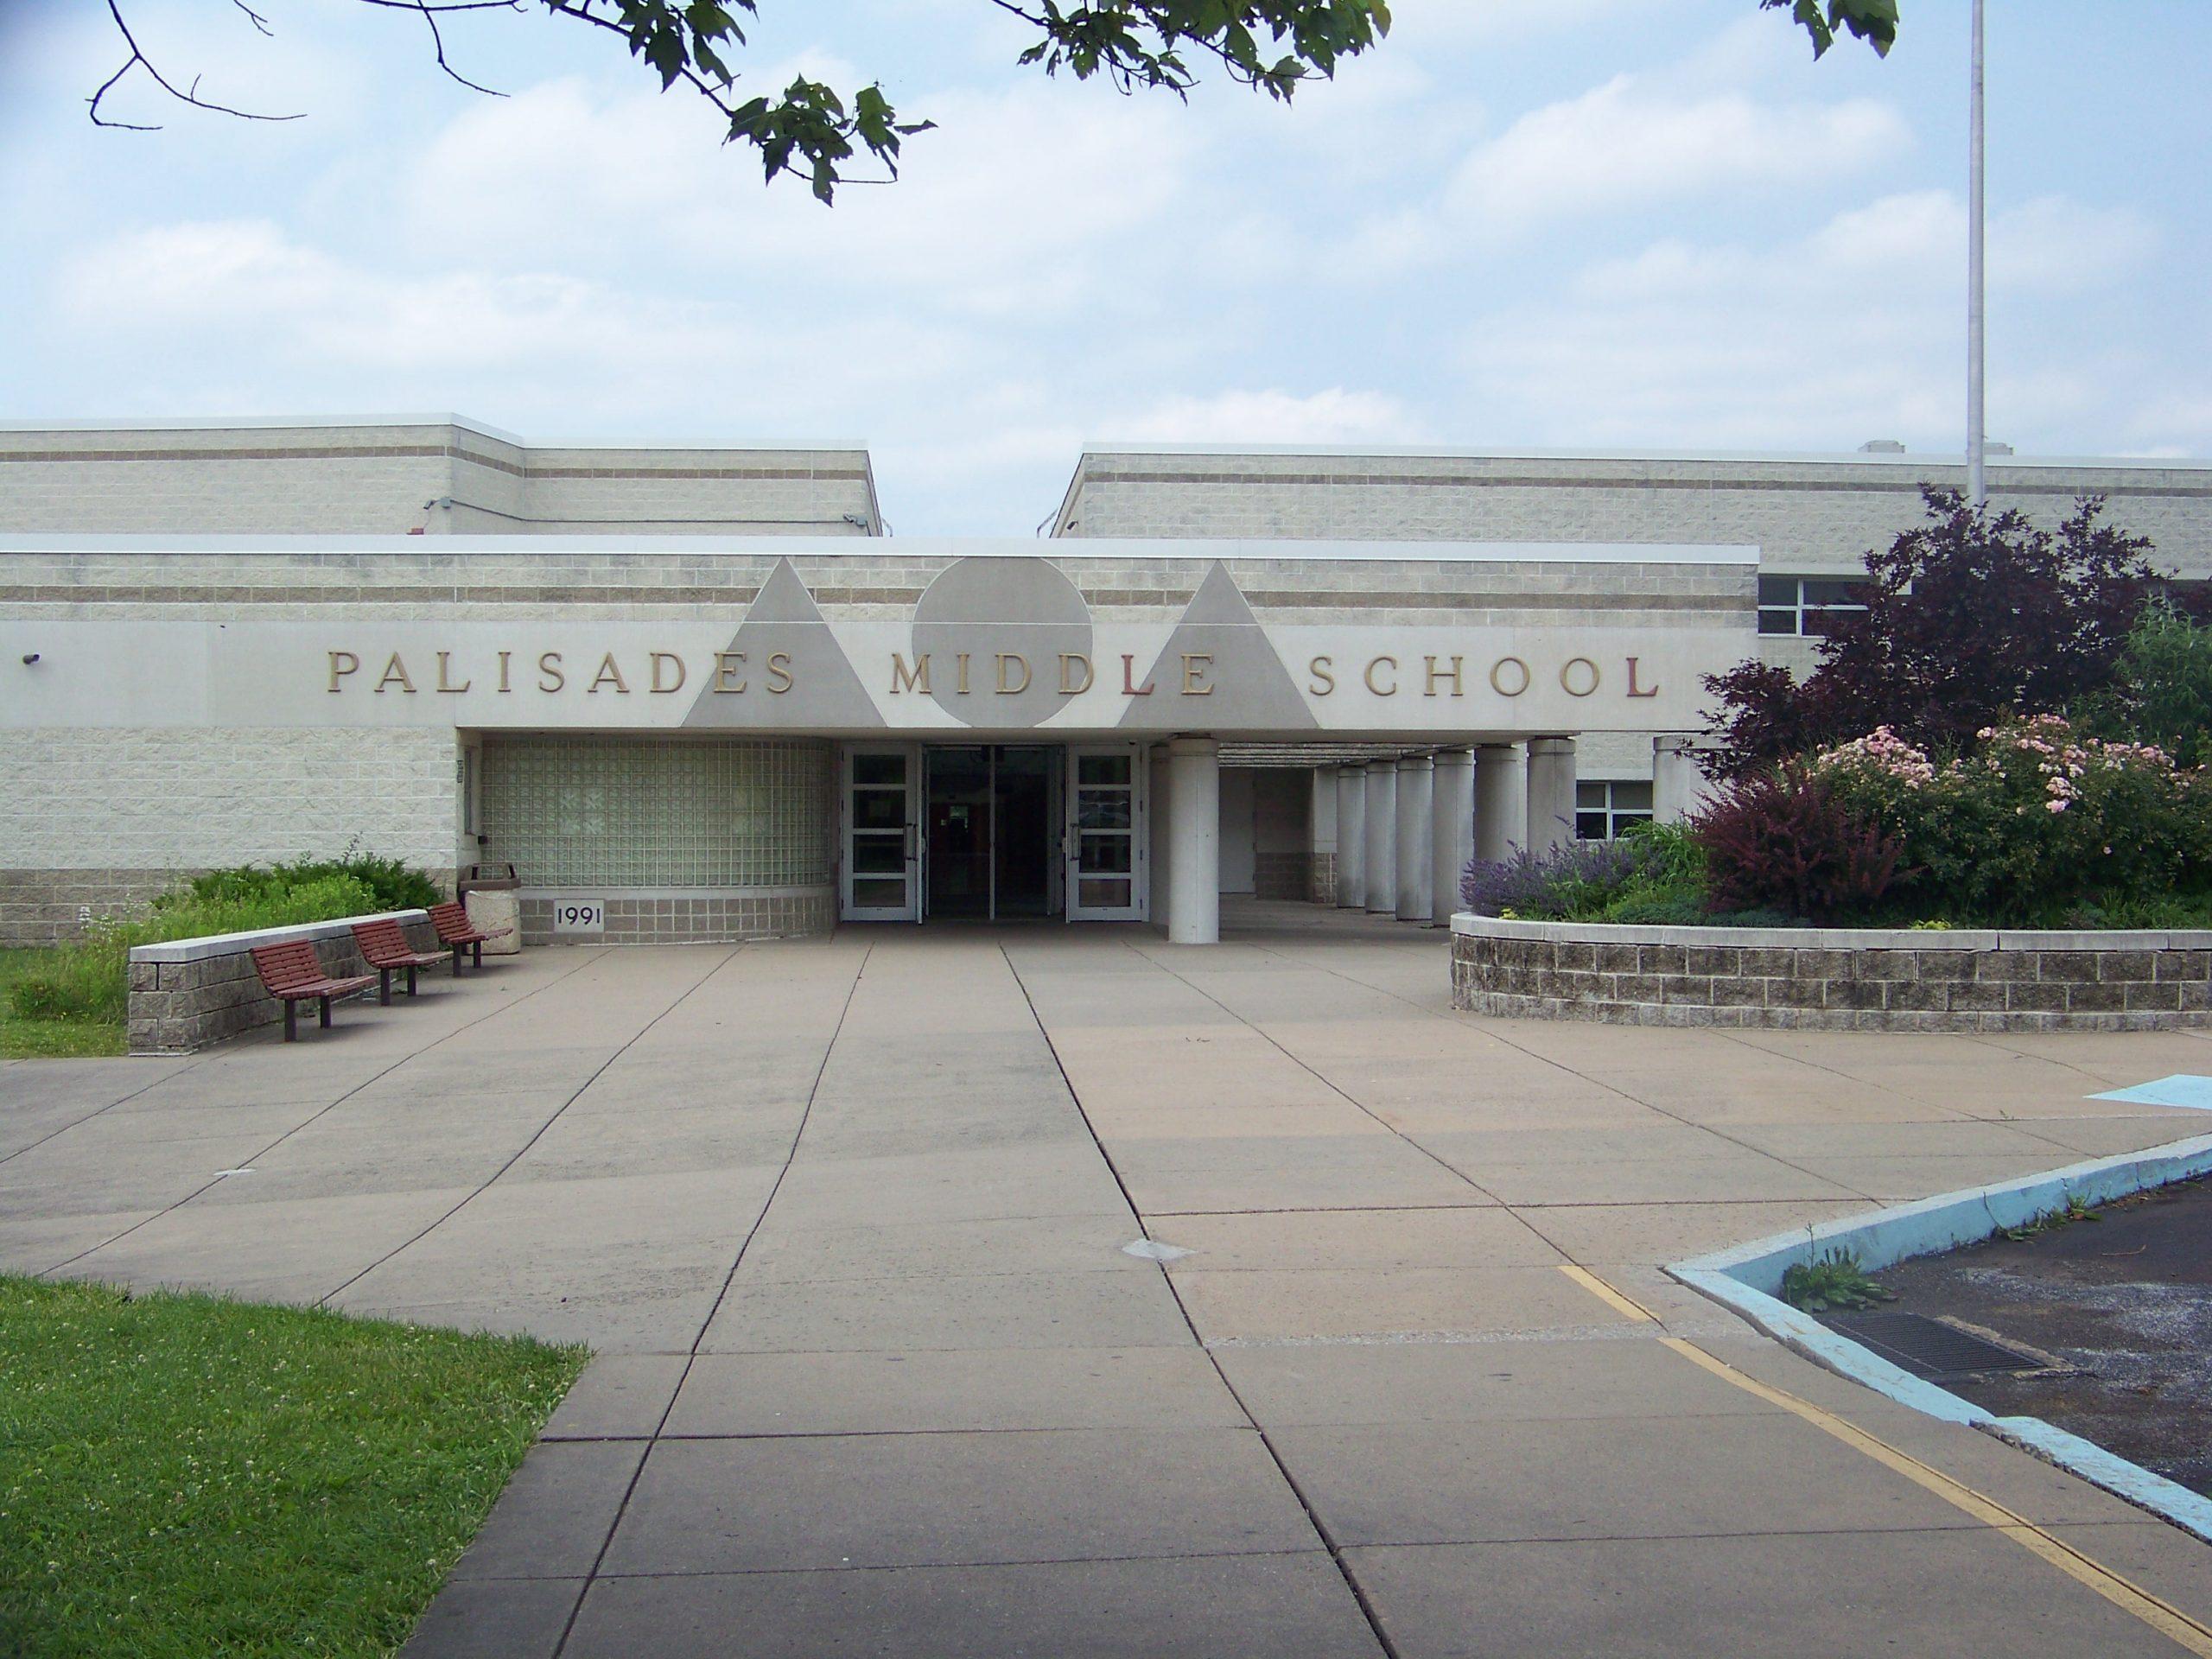 Colonial League Of Interscholastic Sports, Inc. (2013 2014 In East Stroudsburg Area School District Calendar